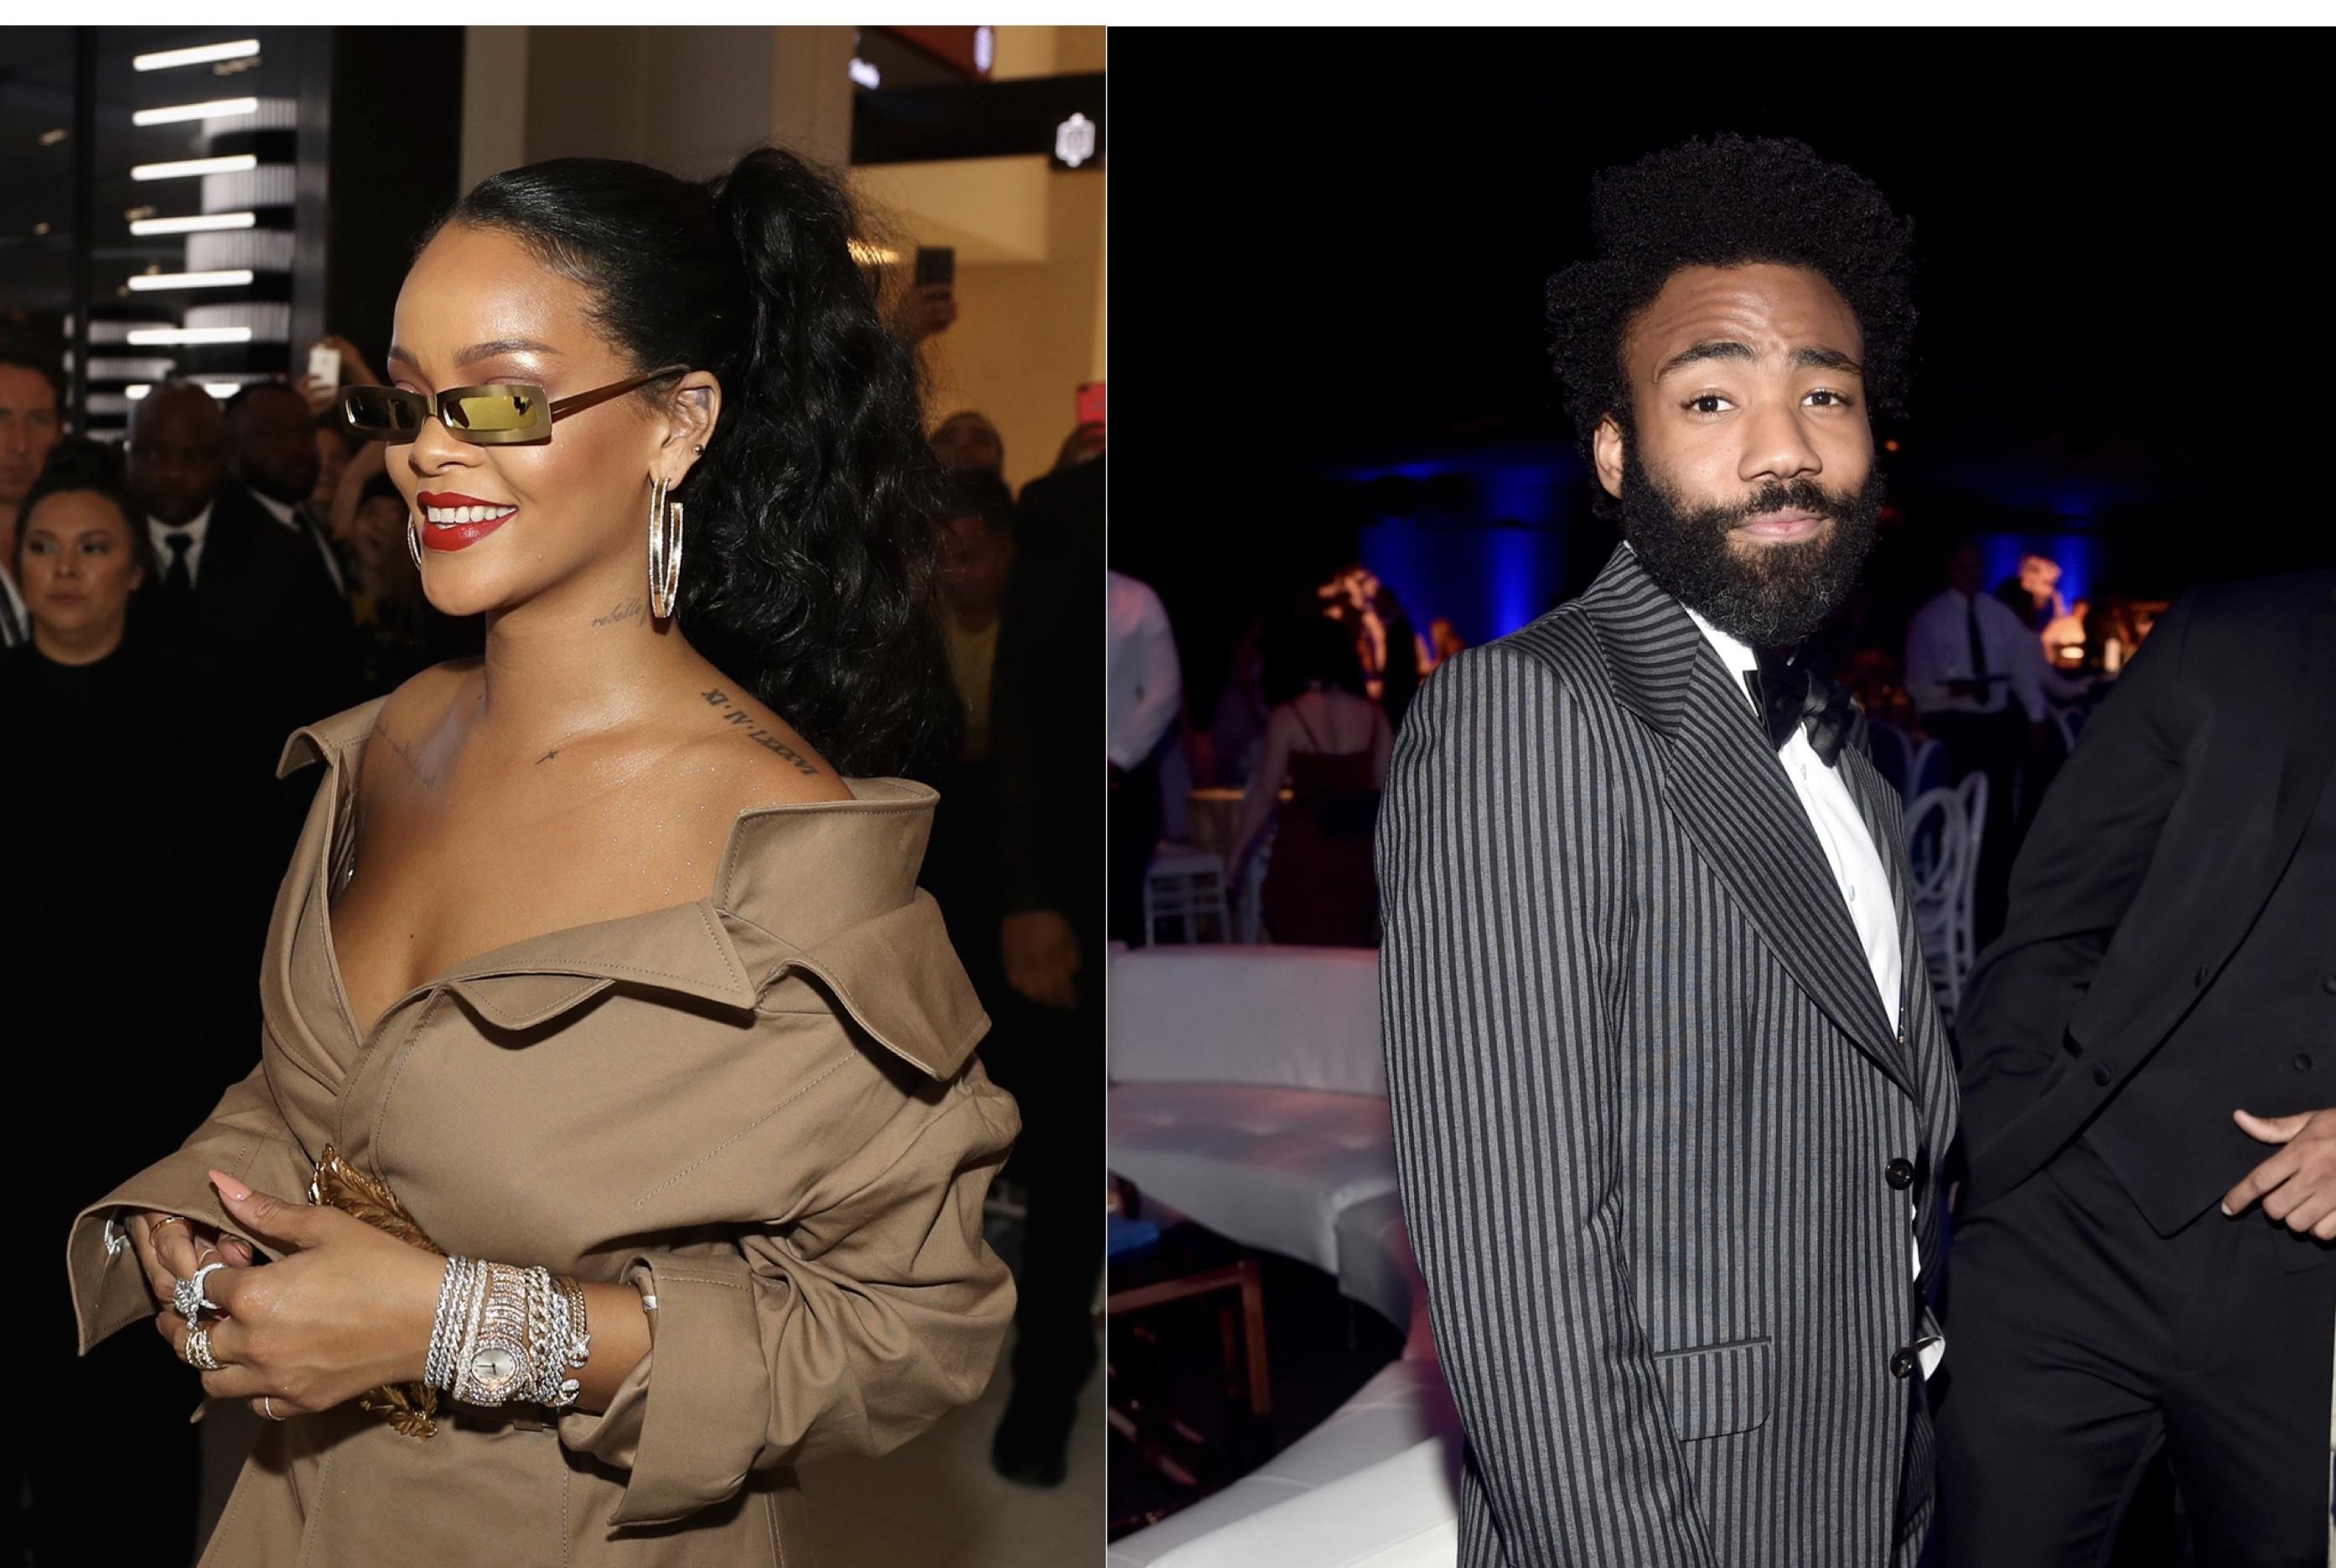 Rihanna & Childish Gambino's 'Guava Island' Film Premieres This Weekend During Coachella!